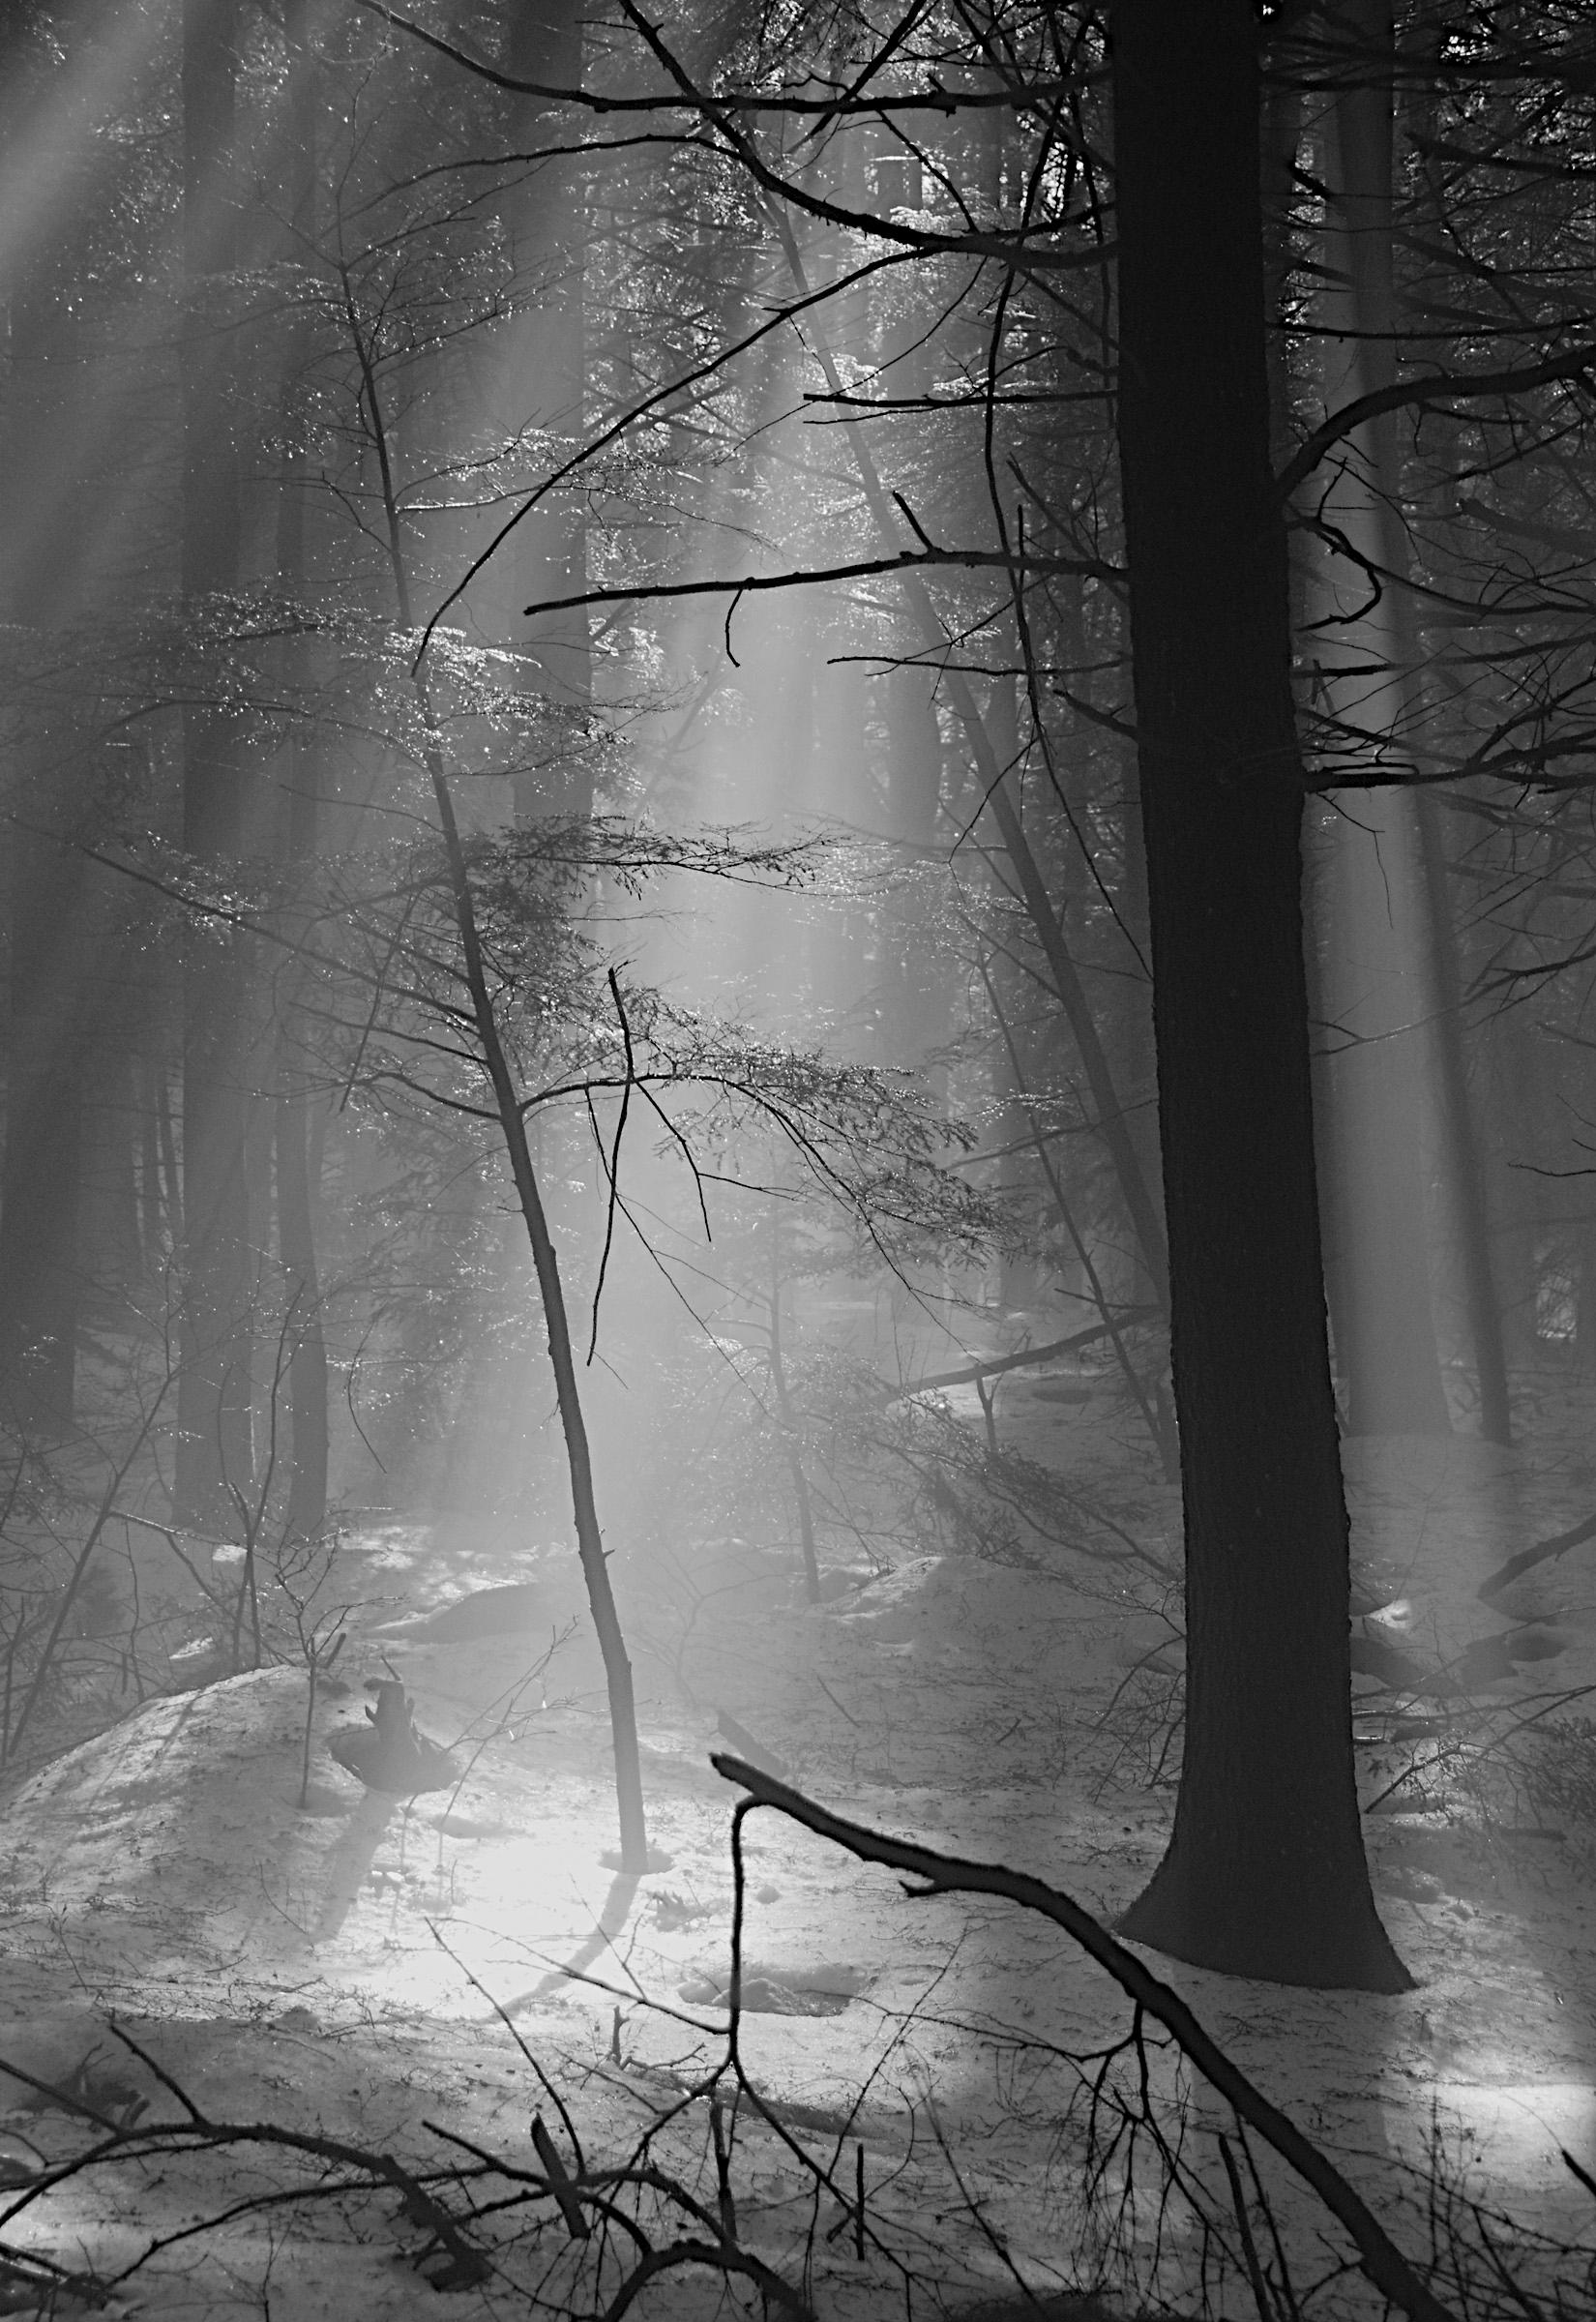 Hemlock in the mist